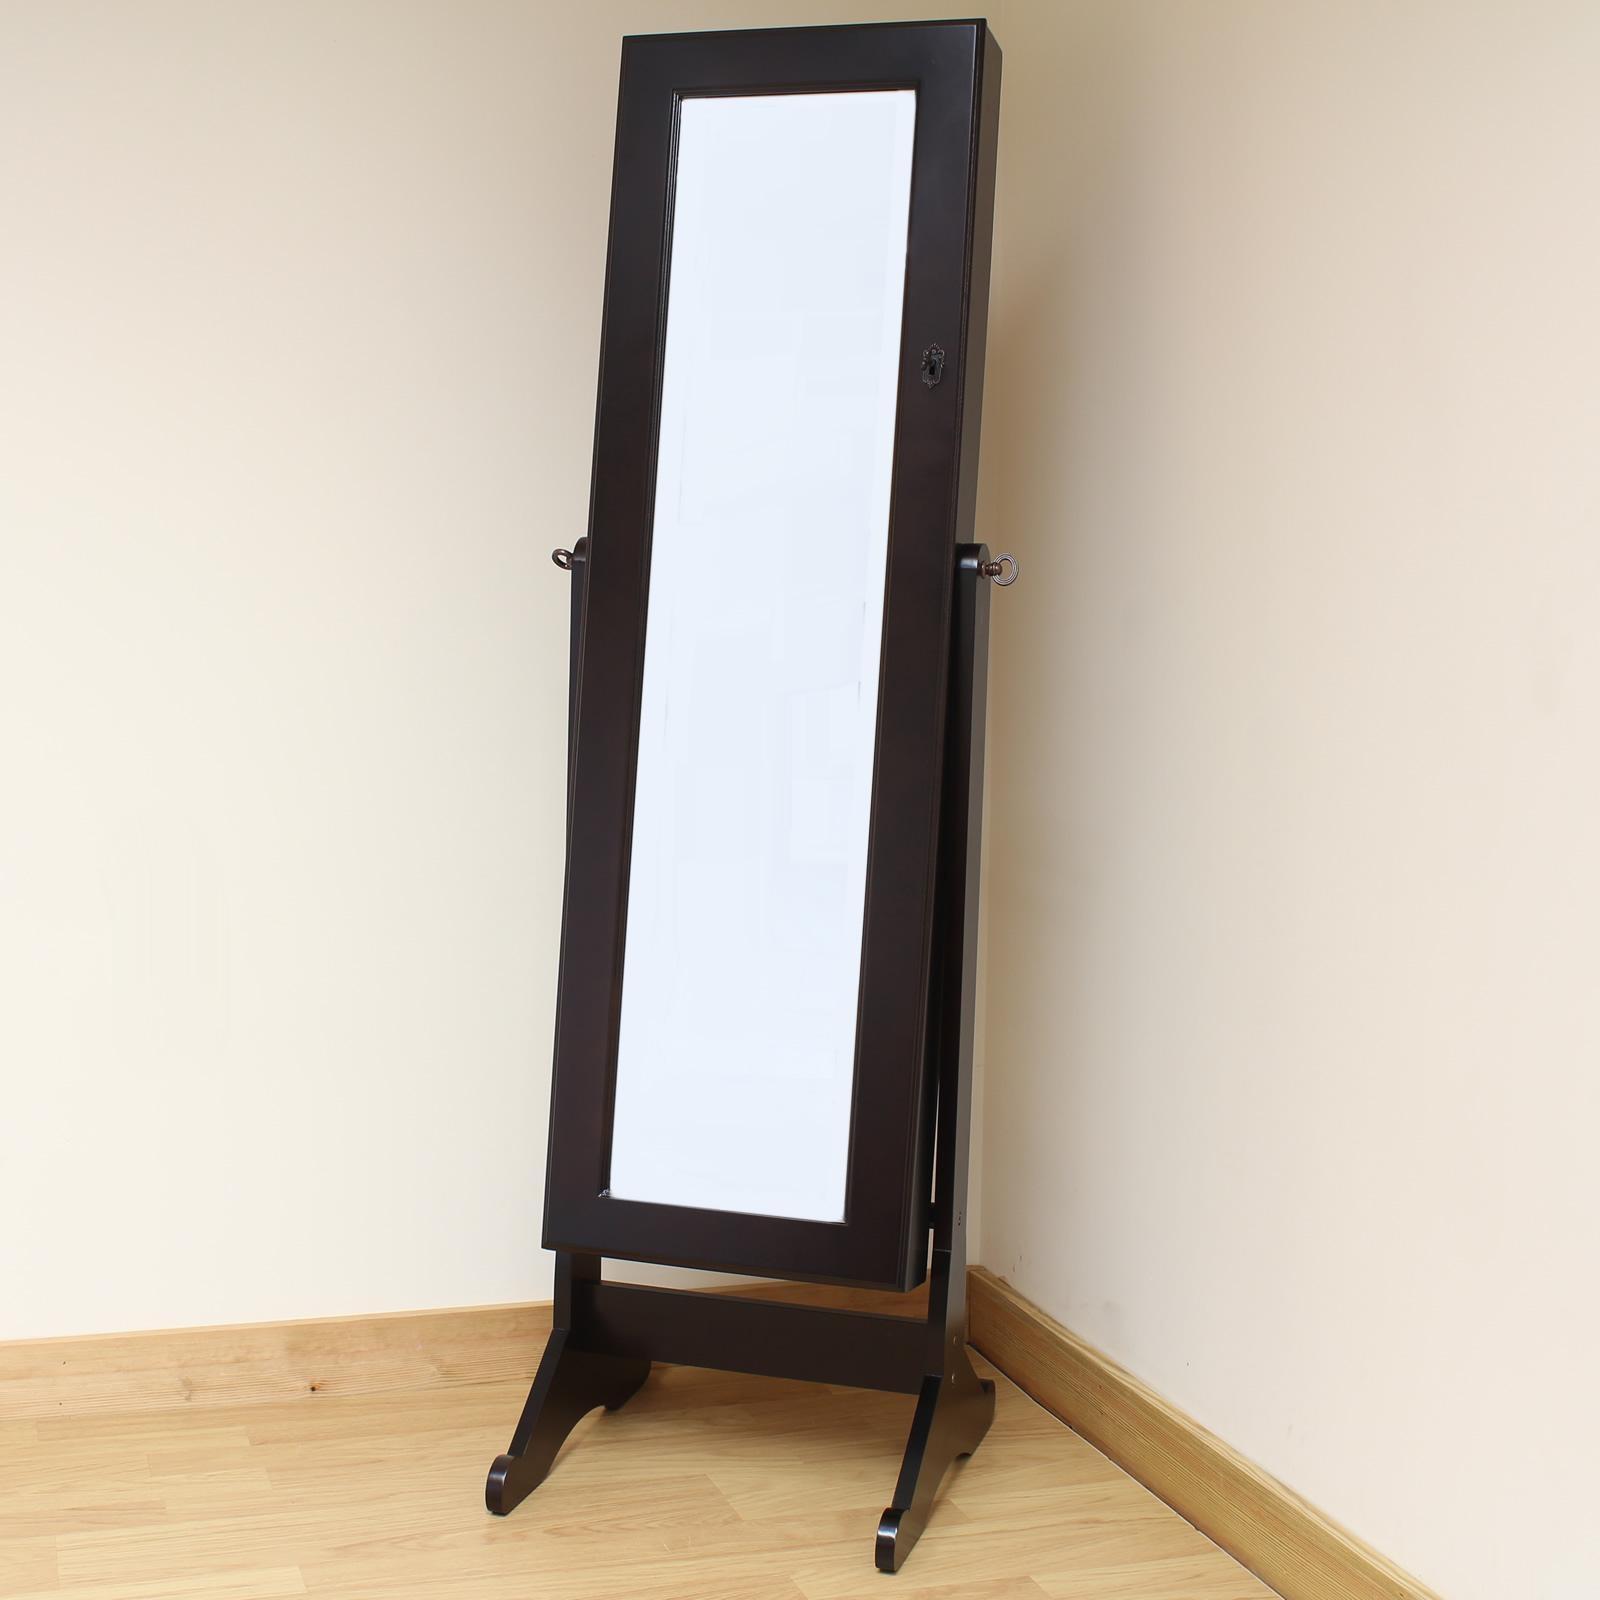 Homeware: Oval Full Length Standing Mirror | Large Floor Mirrors Regarding Cream Floor Standing Mirror (View 12 of 20)